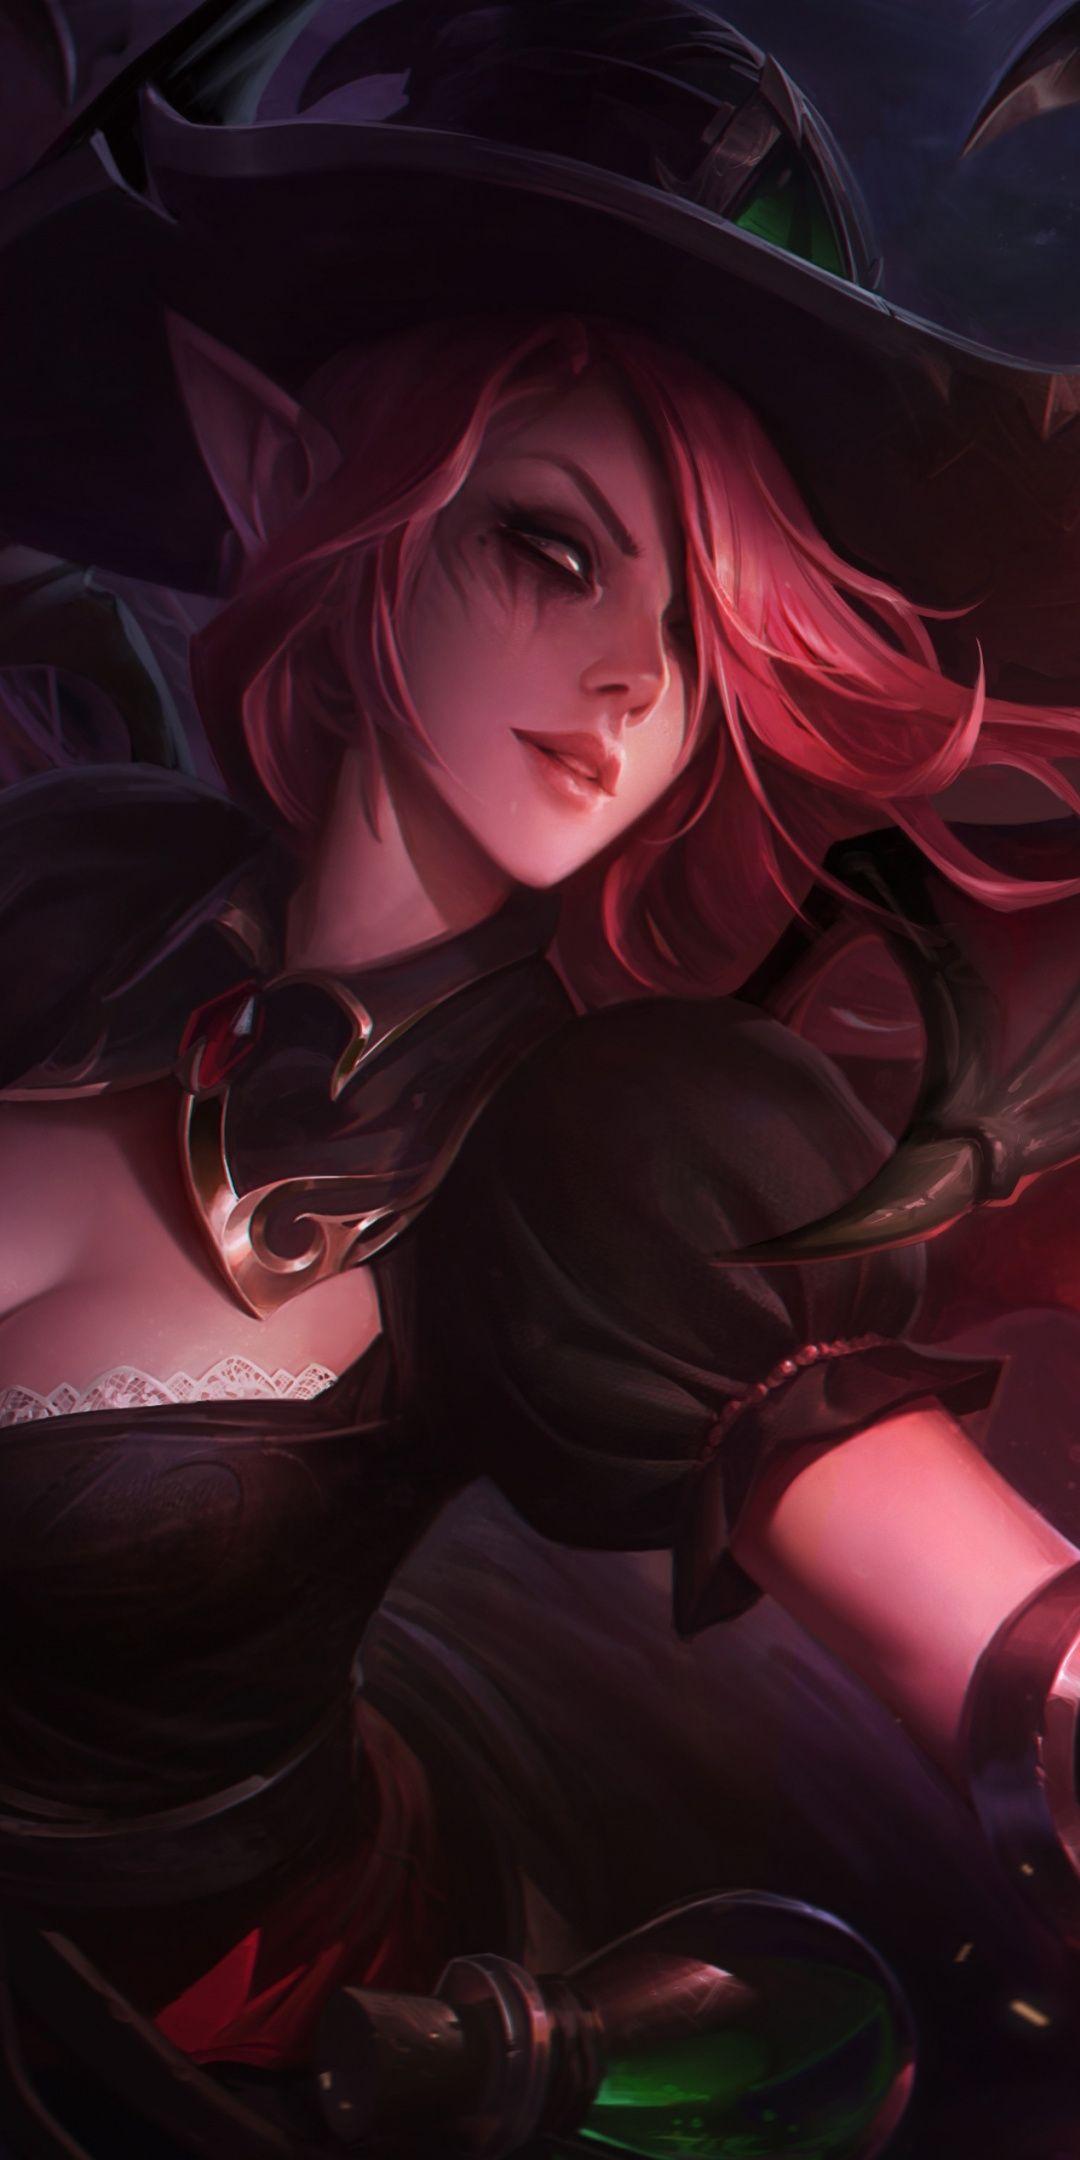 Magician League of Legends, art, 1080x2160